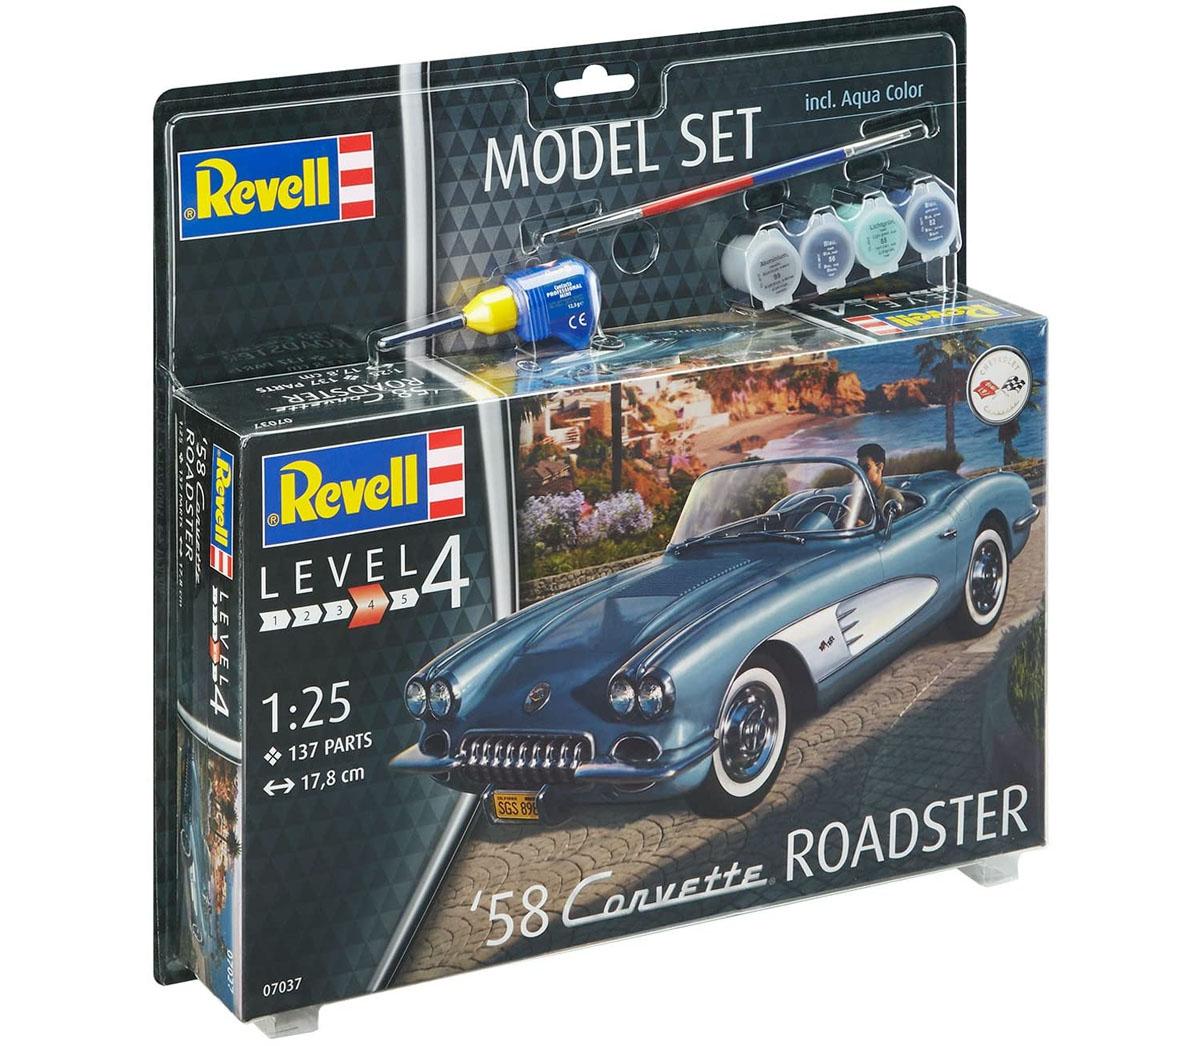 Model Set Corvette Roadster 1958 - 1/25 - Revell 67037  - BLIMPS COMÉRCIO ELETRÔNICO